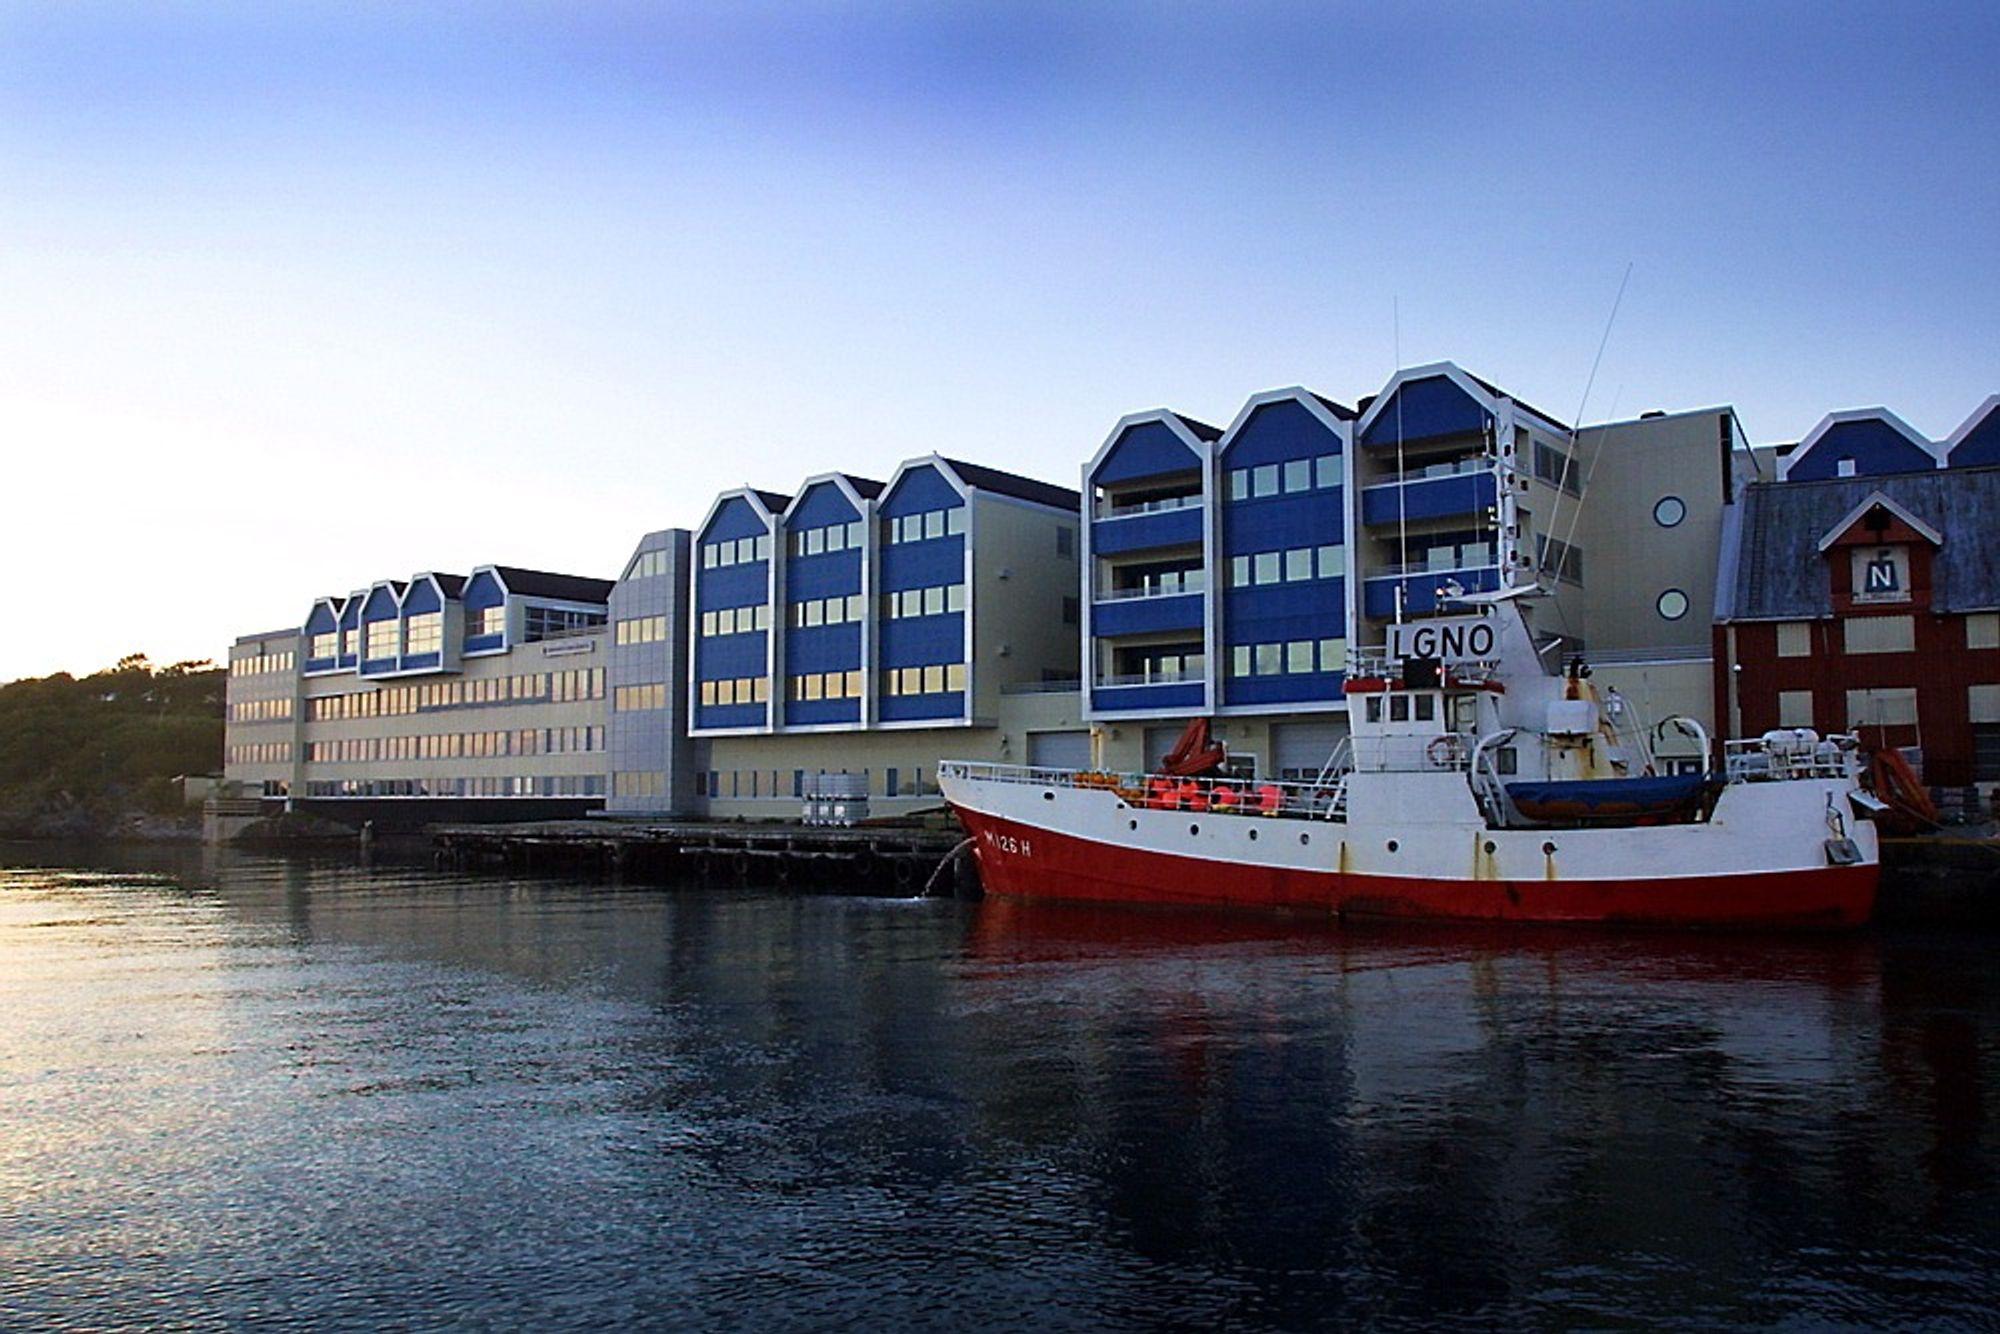 ALTINN i BRØNNØYSUND: Idylliske omgivelser, trøbbel i systemet. Foto: Gorm Kallestad / SCANPIX